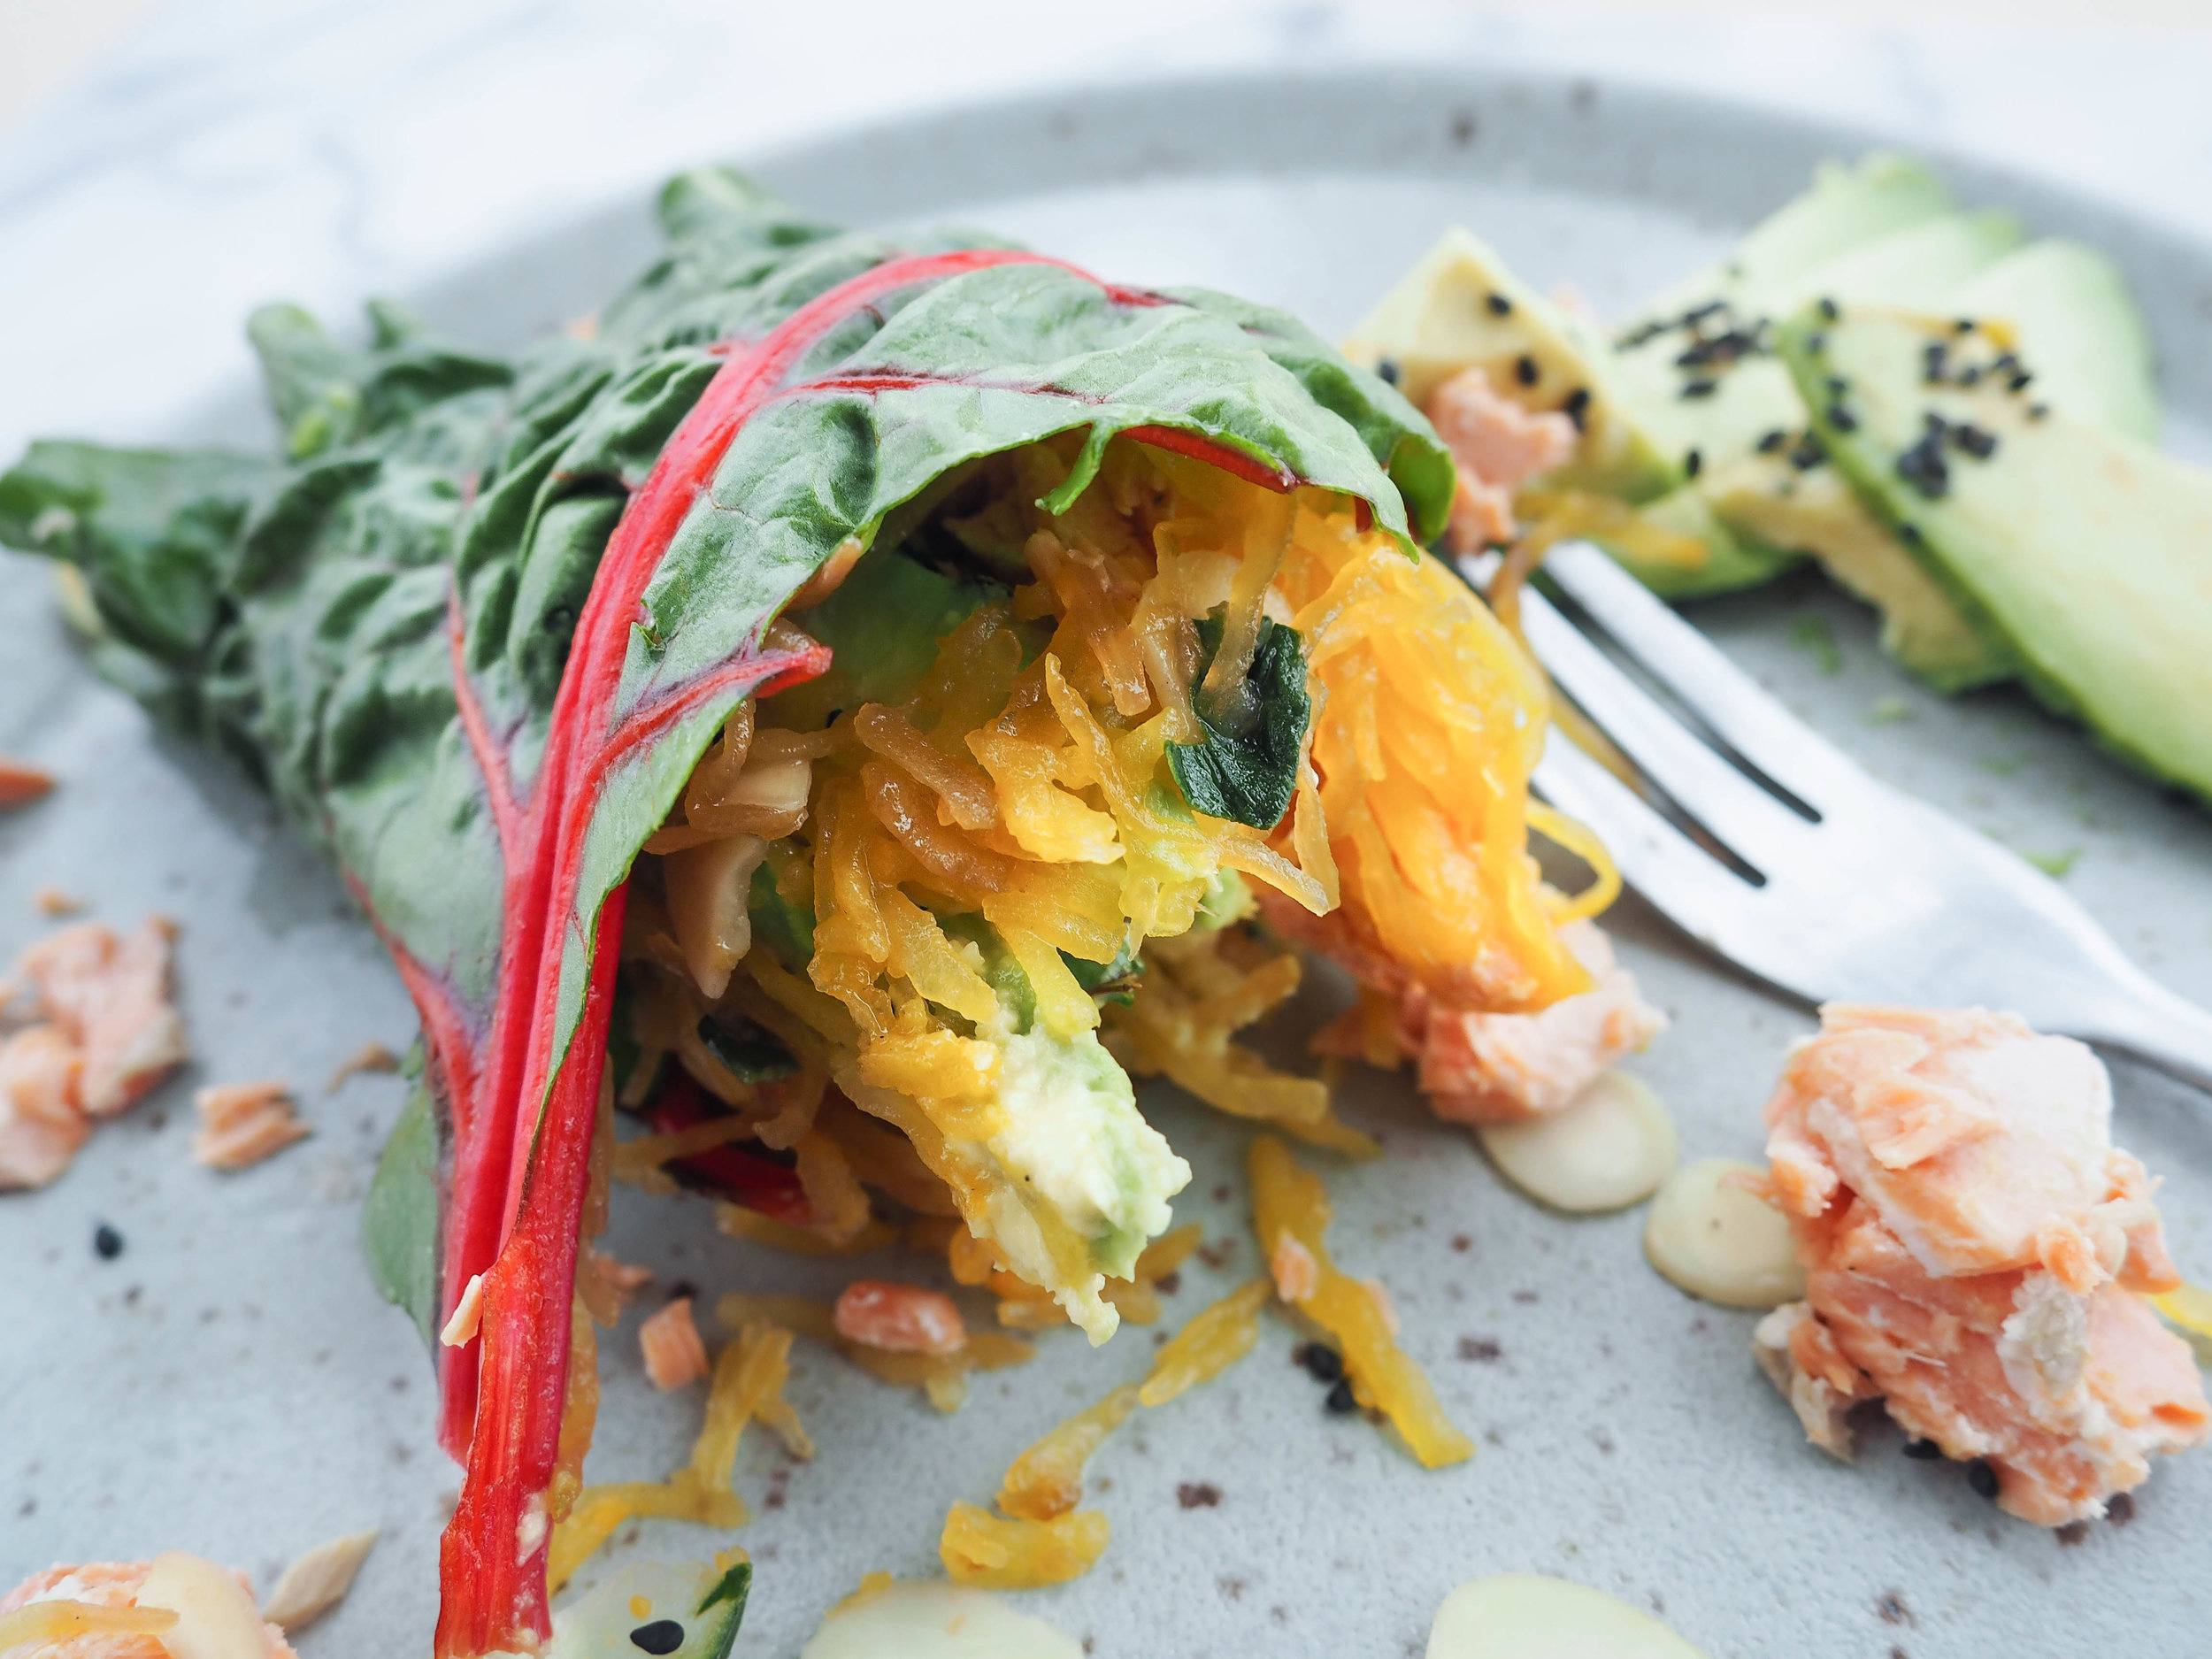 Wrap n' Roll: Avocado-Salmon Rainbow Chard Warp